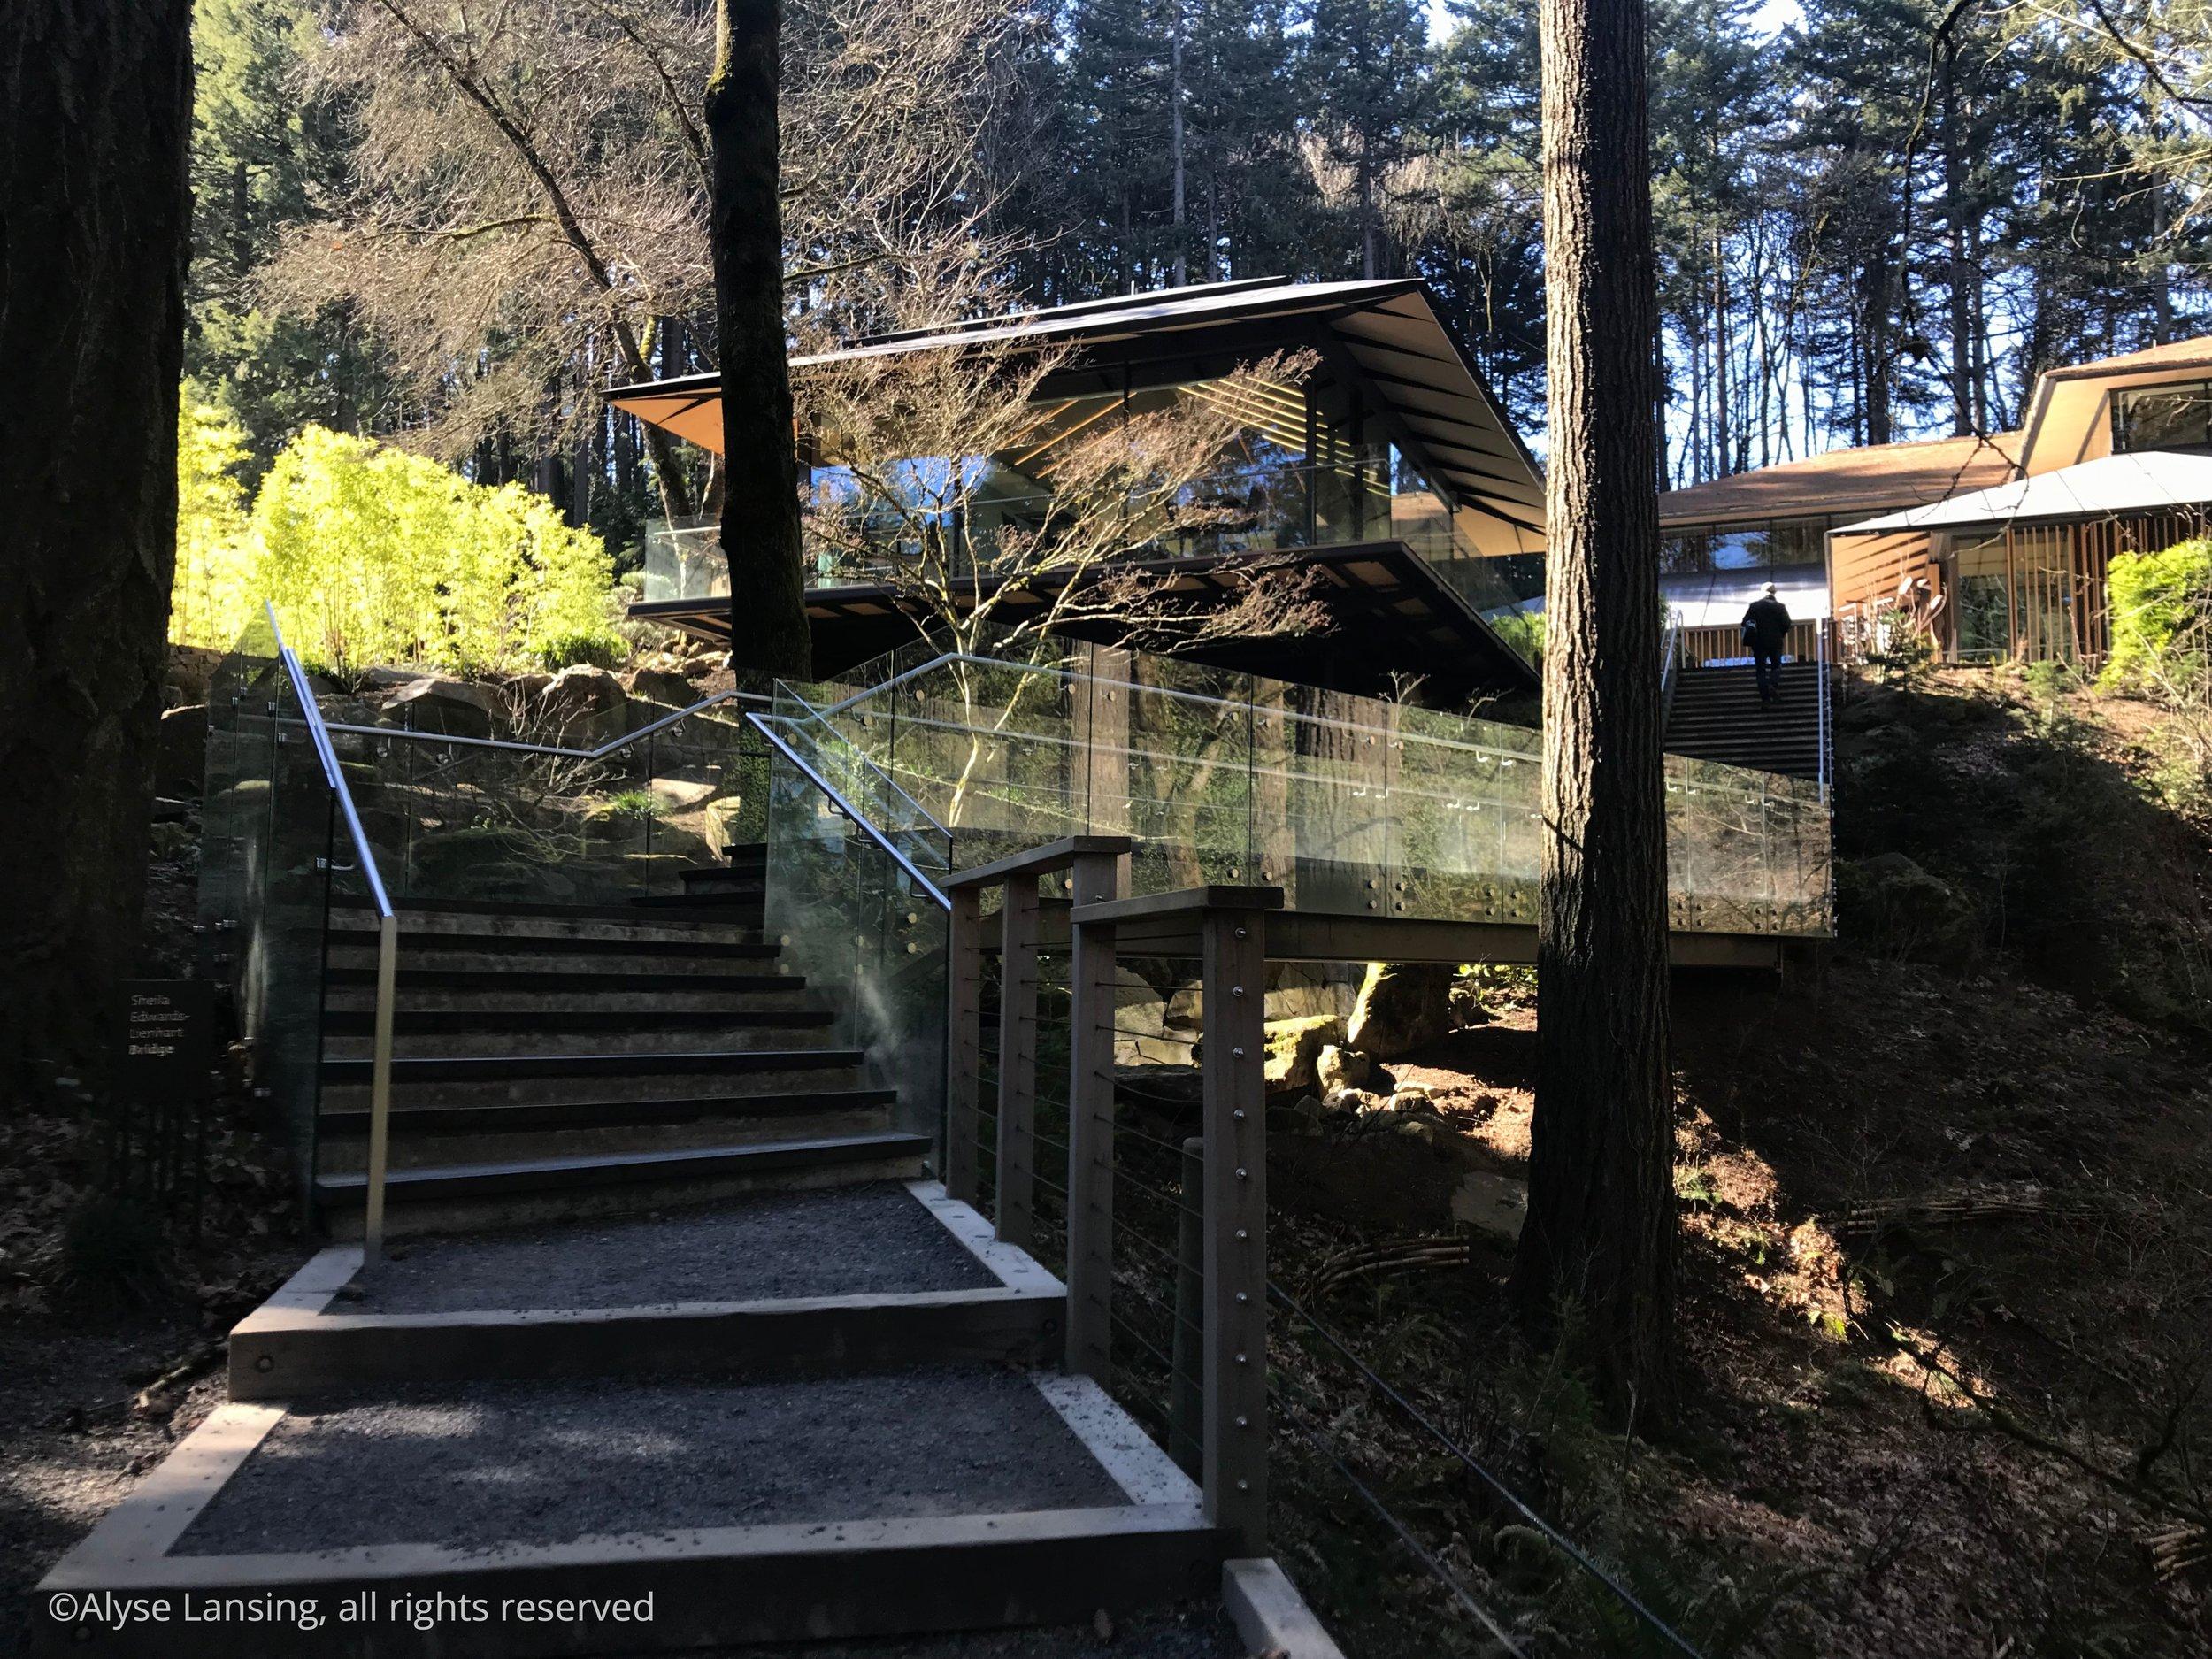 2017-03-04__1500-wide - 17- bridge (transition).jpg